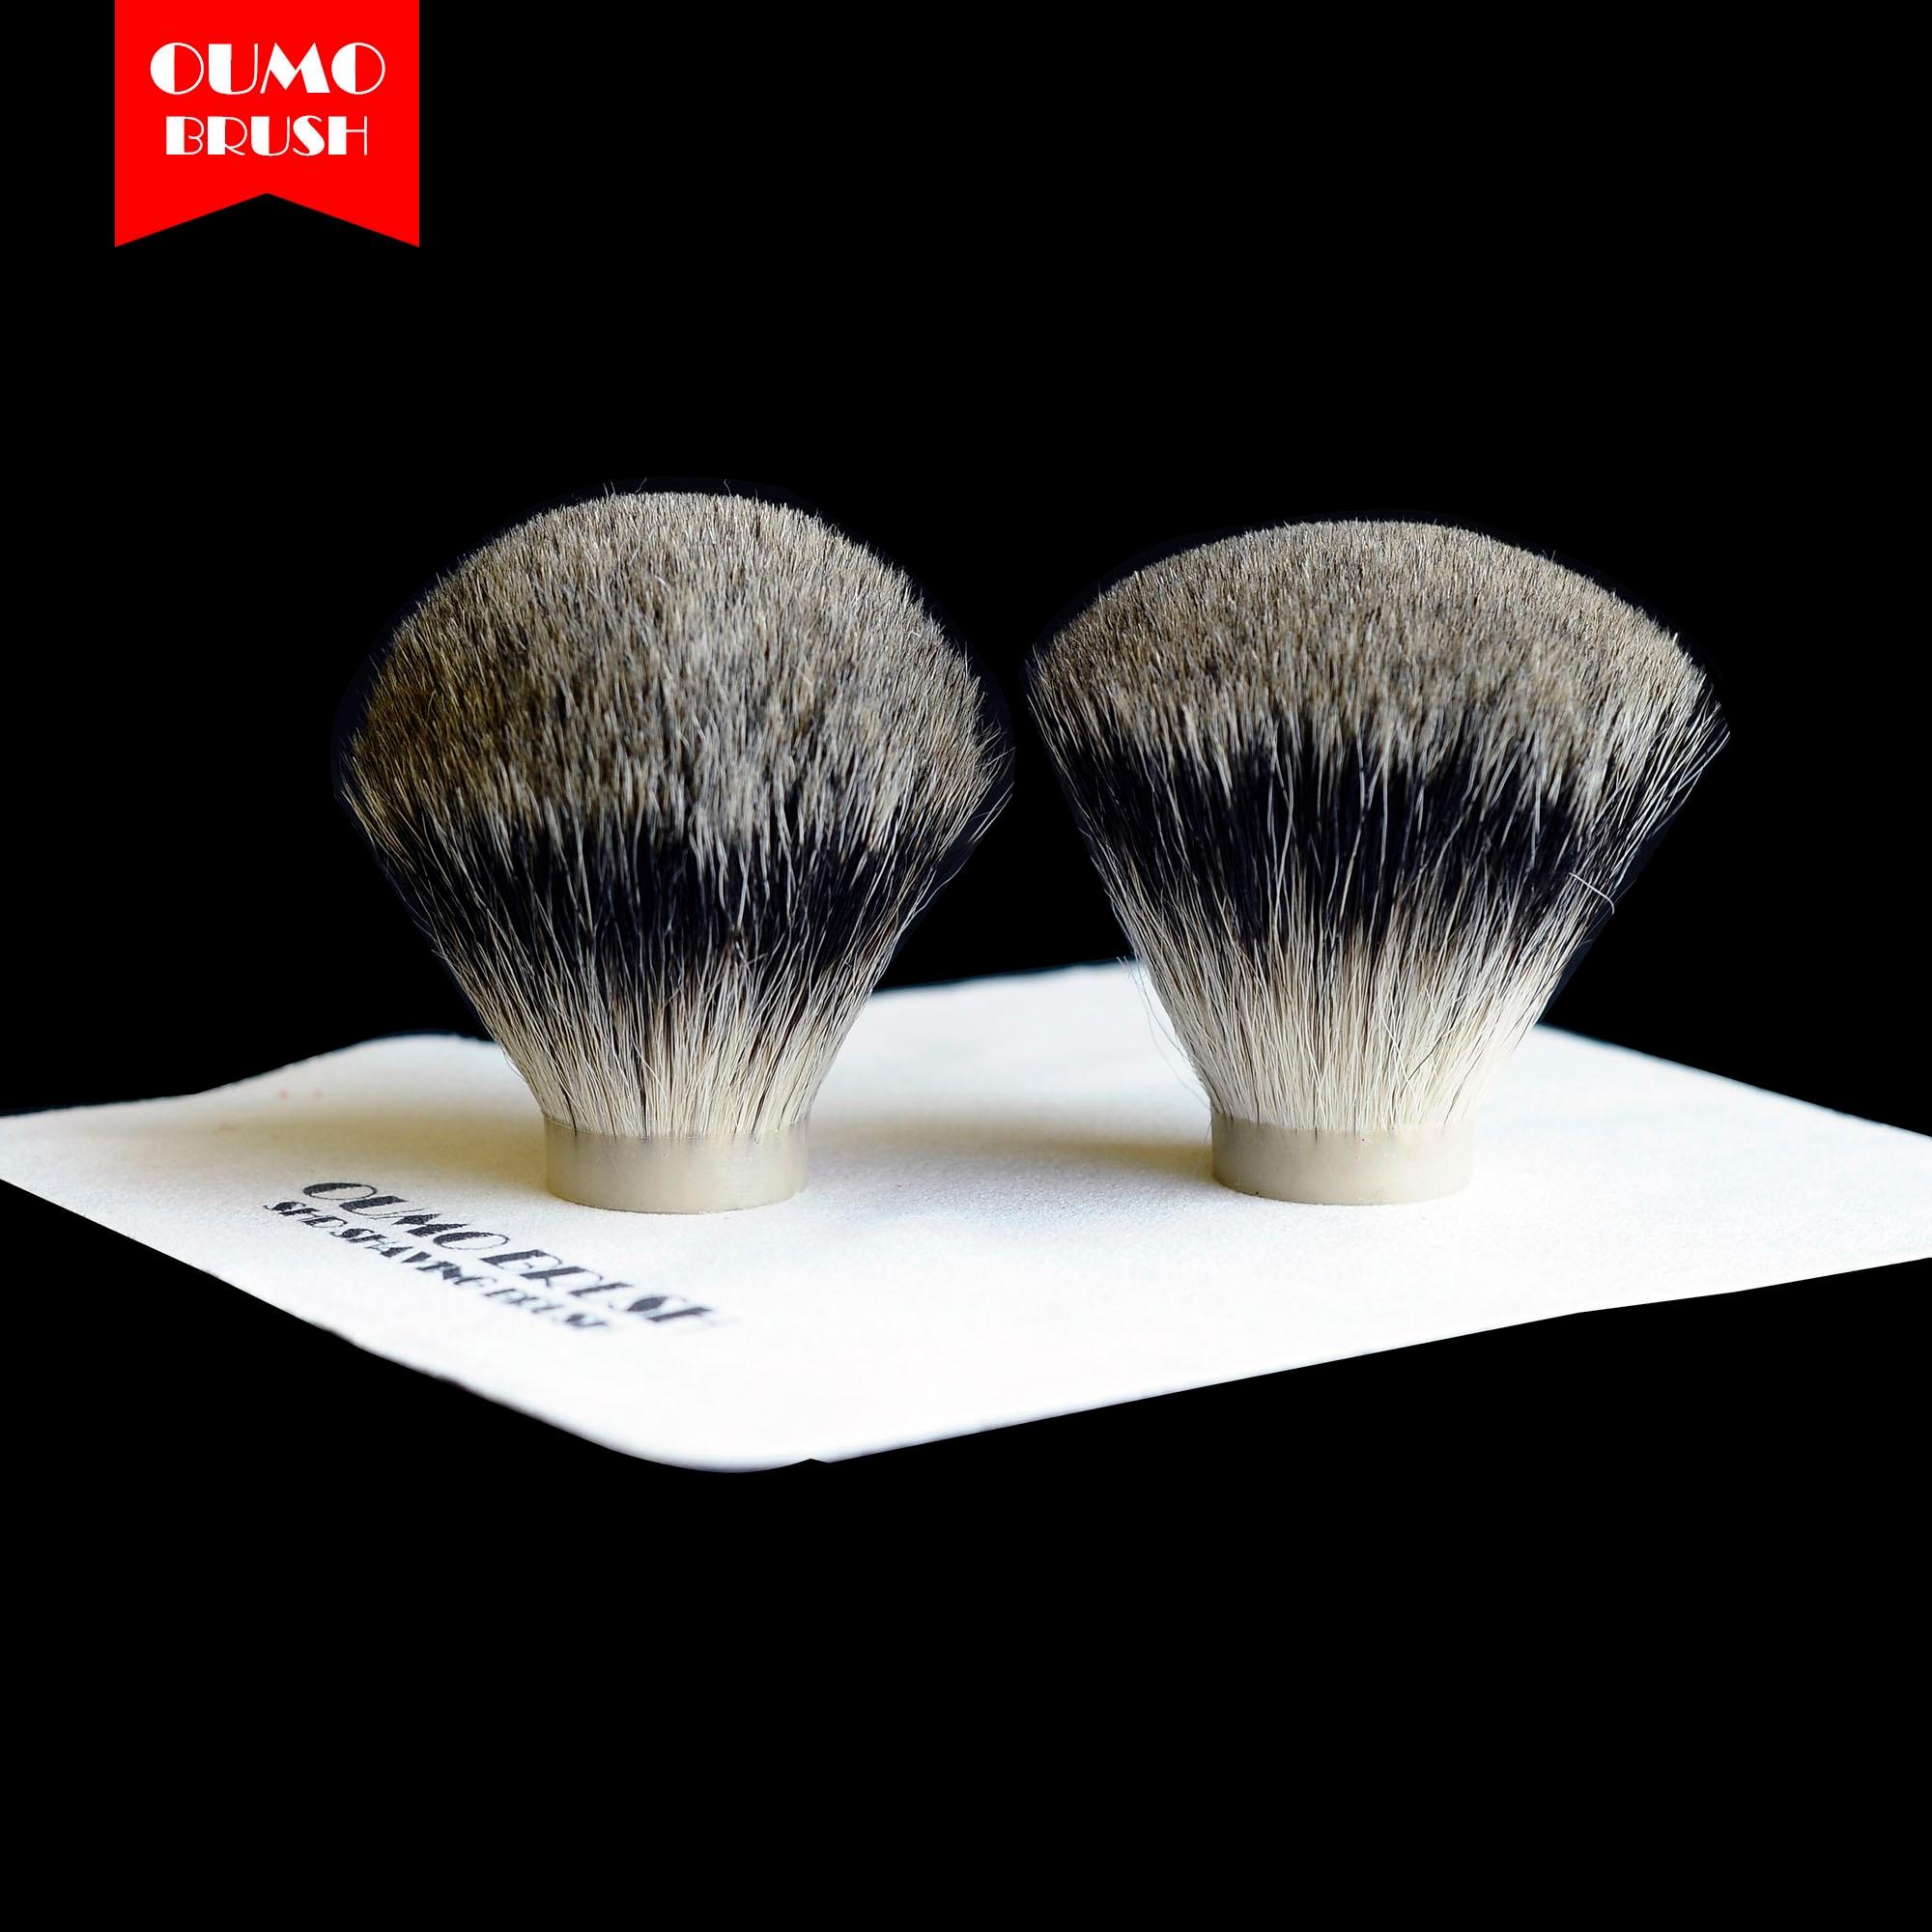 OUMO BRUSH-  SHD Pure Two Band Badger Hair Knot Shaving Brush Knots